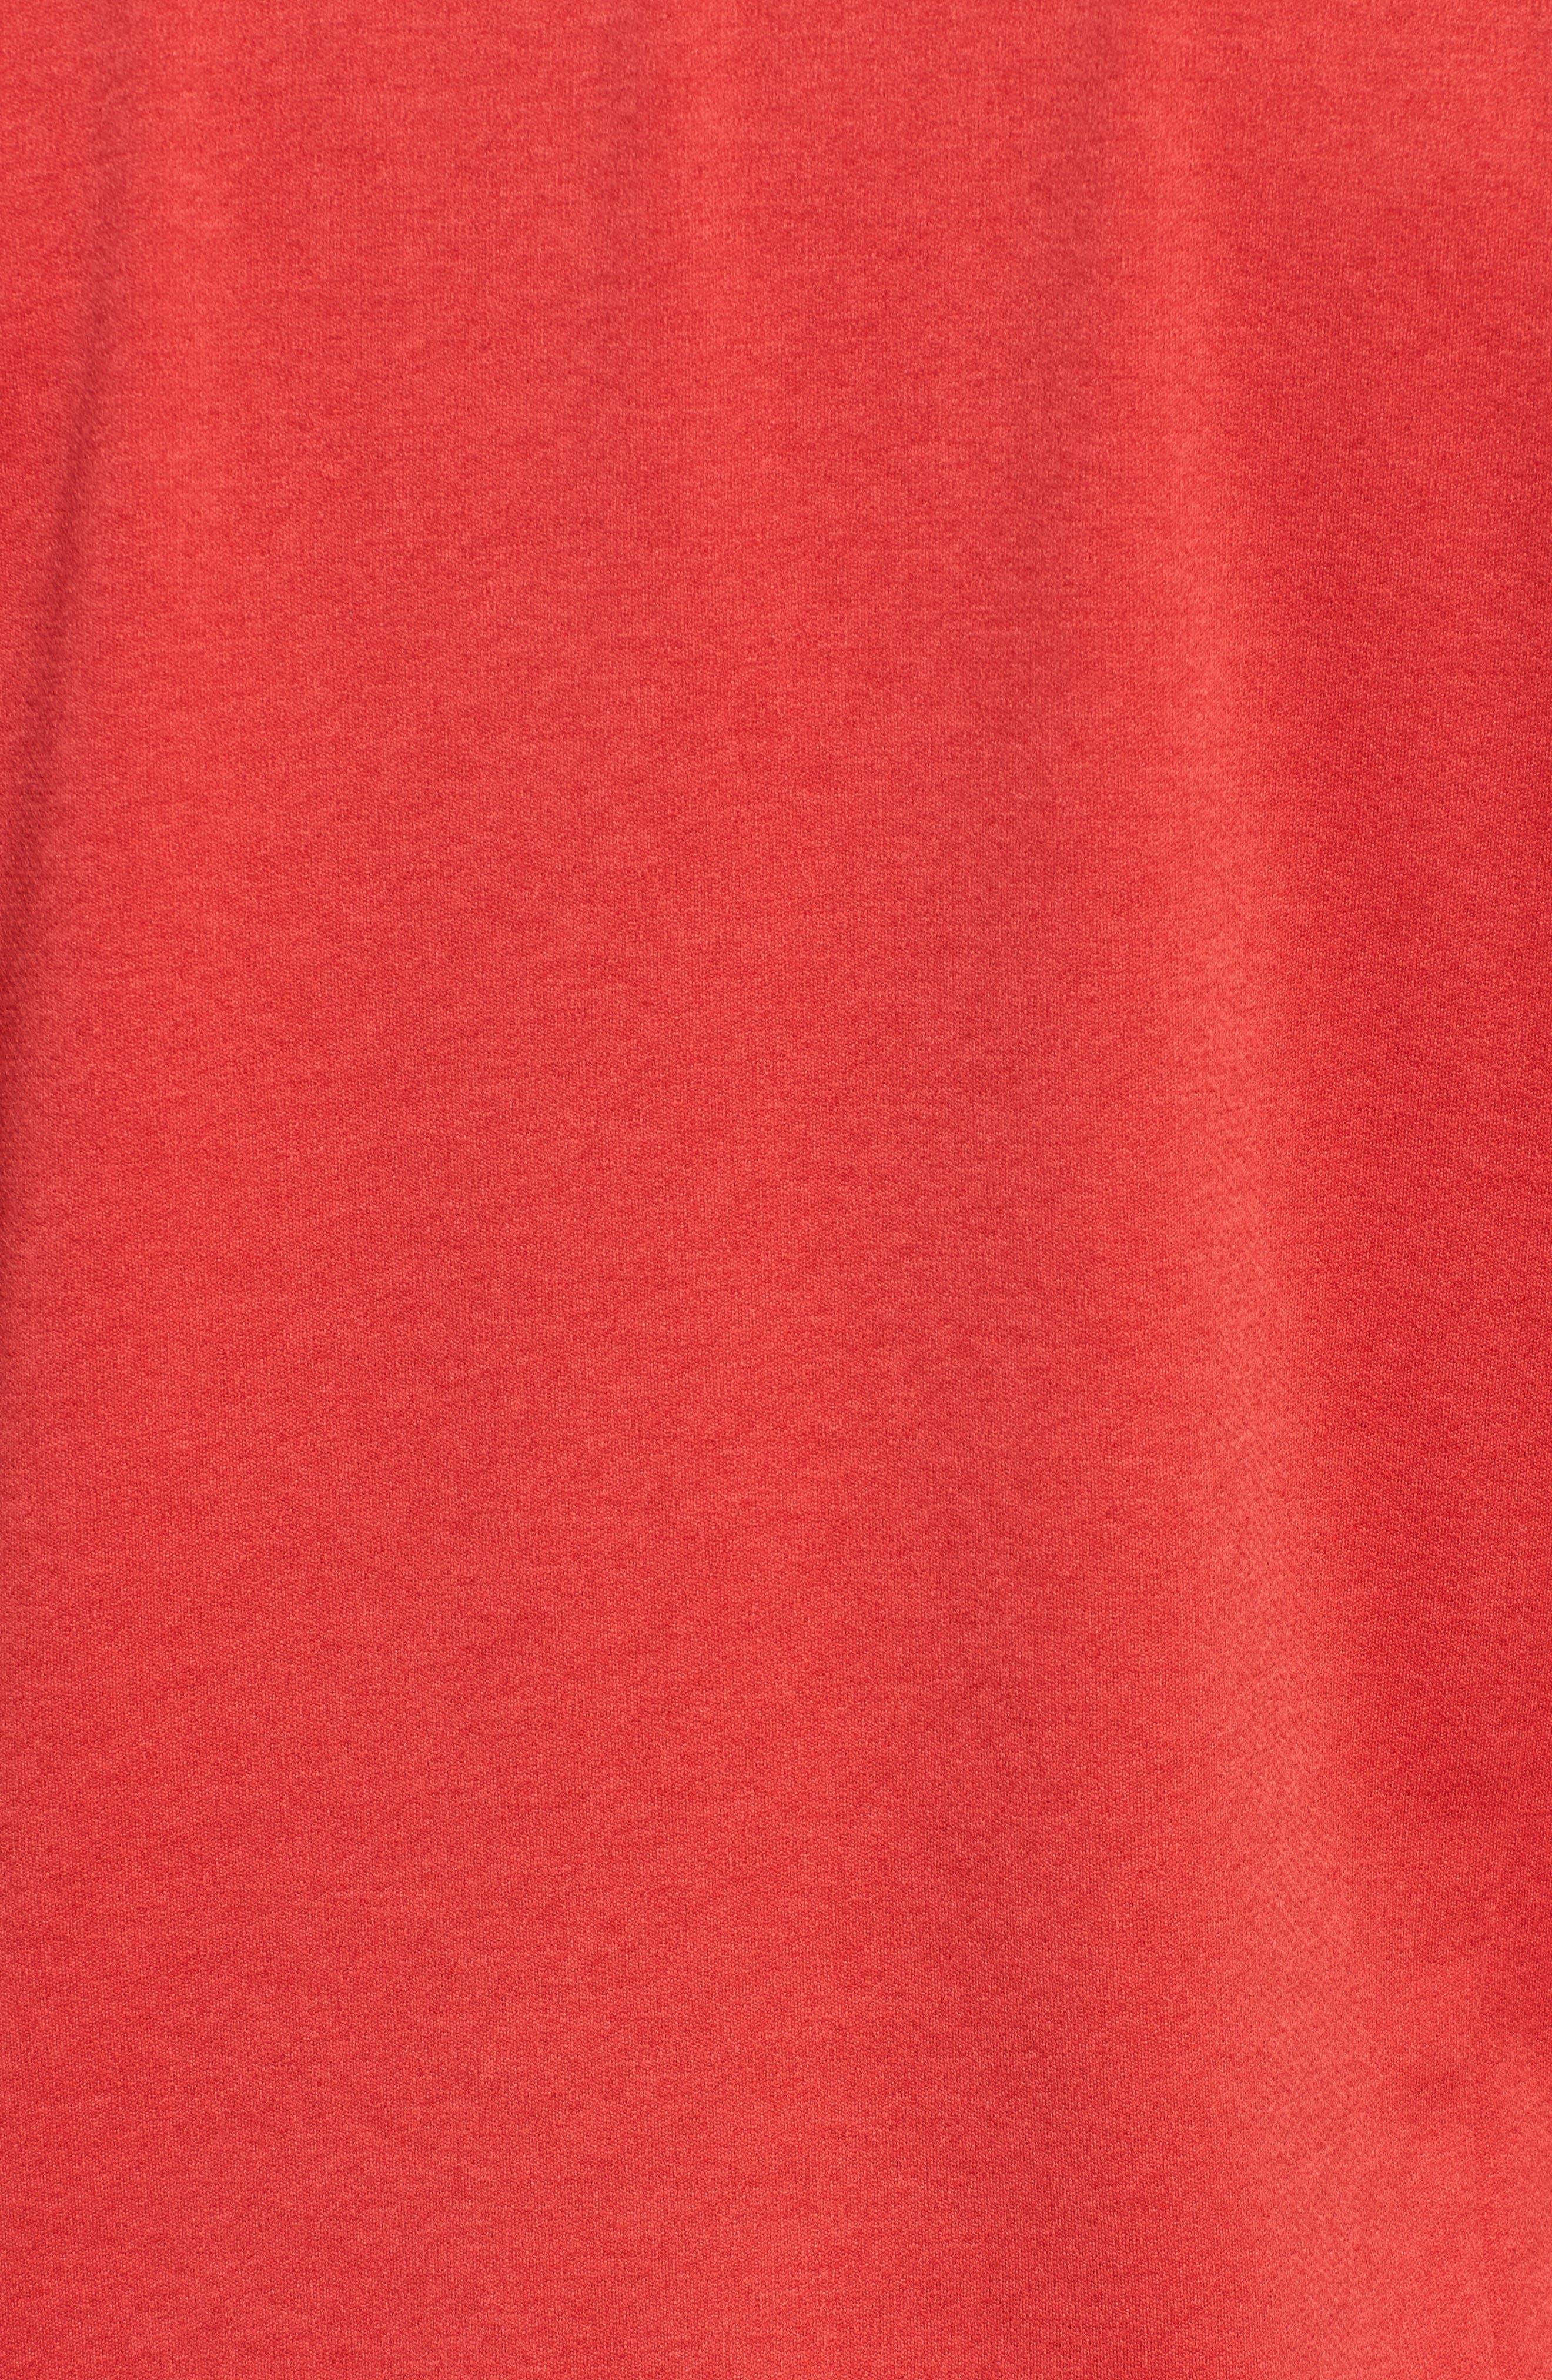 Performance Quarter Zip Pullover,                             Alternate thumbnail 5, color,                             Cuckoo